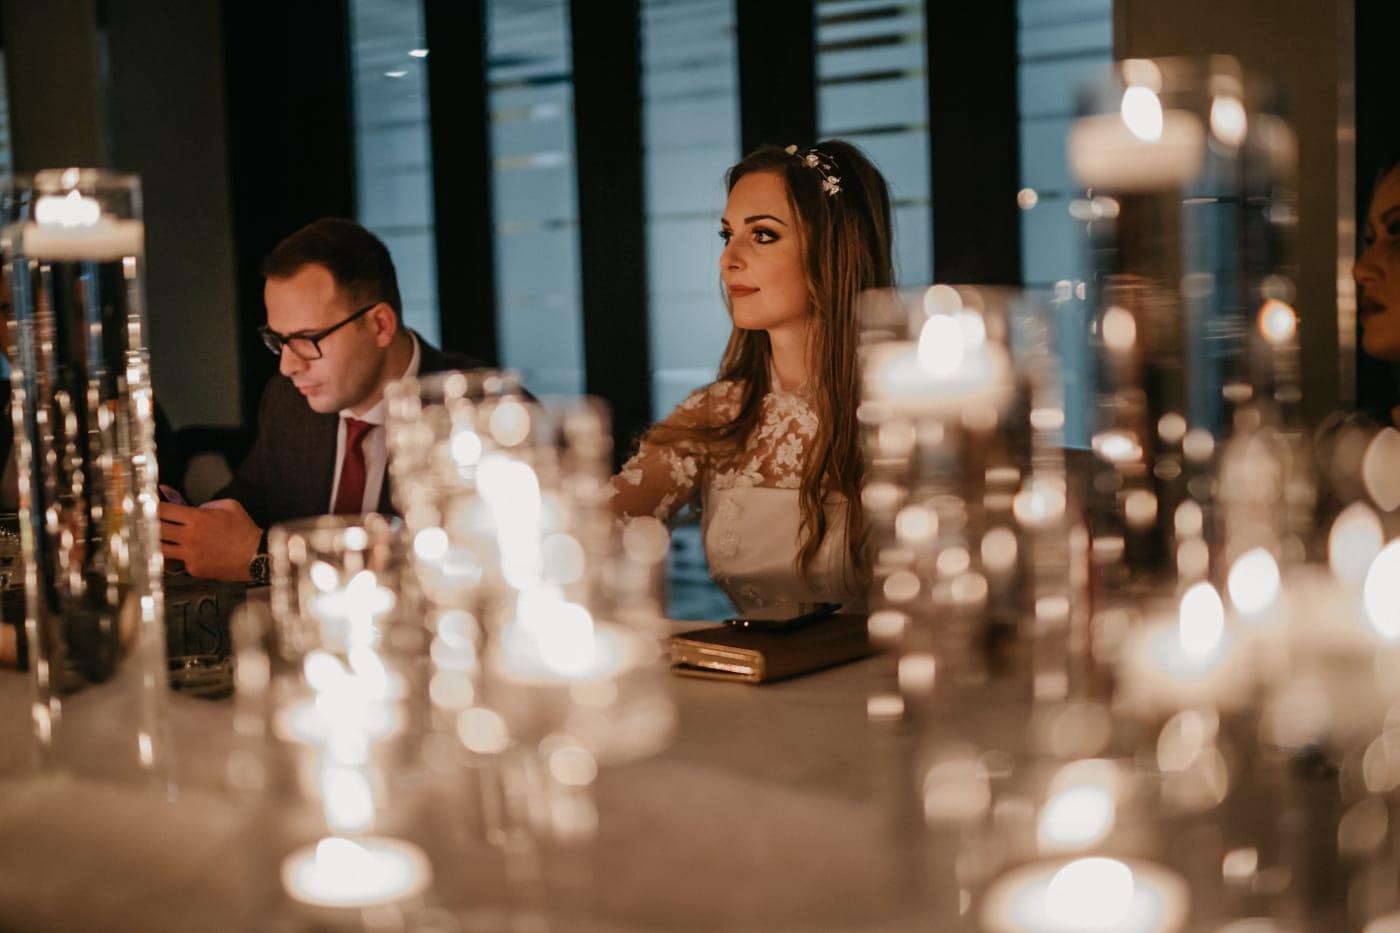 dinner table, love date, candles, candlelight, romantic, girlfriend, boyfriend, couple, woman, man